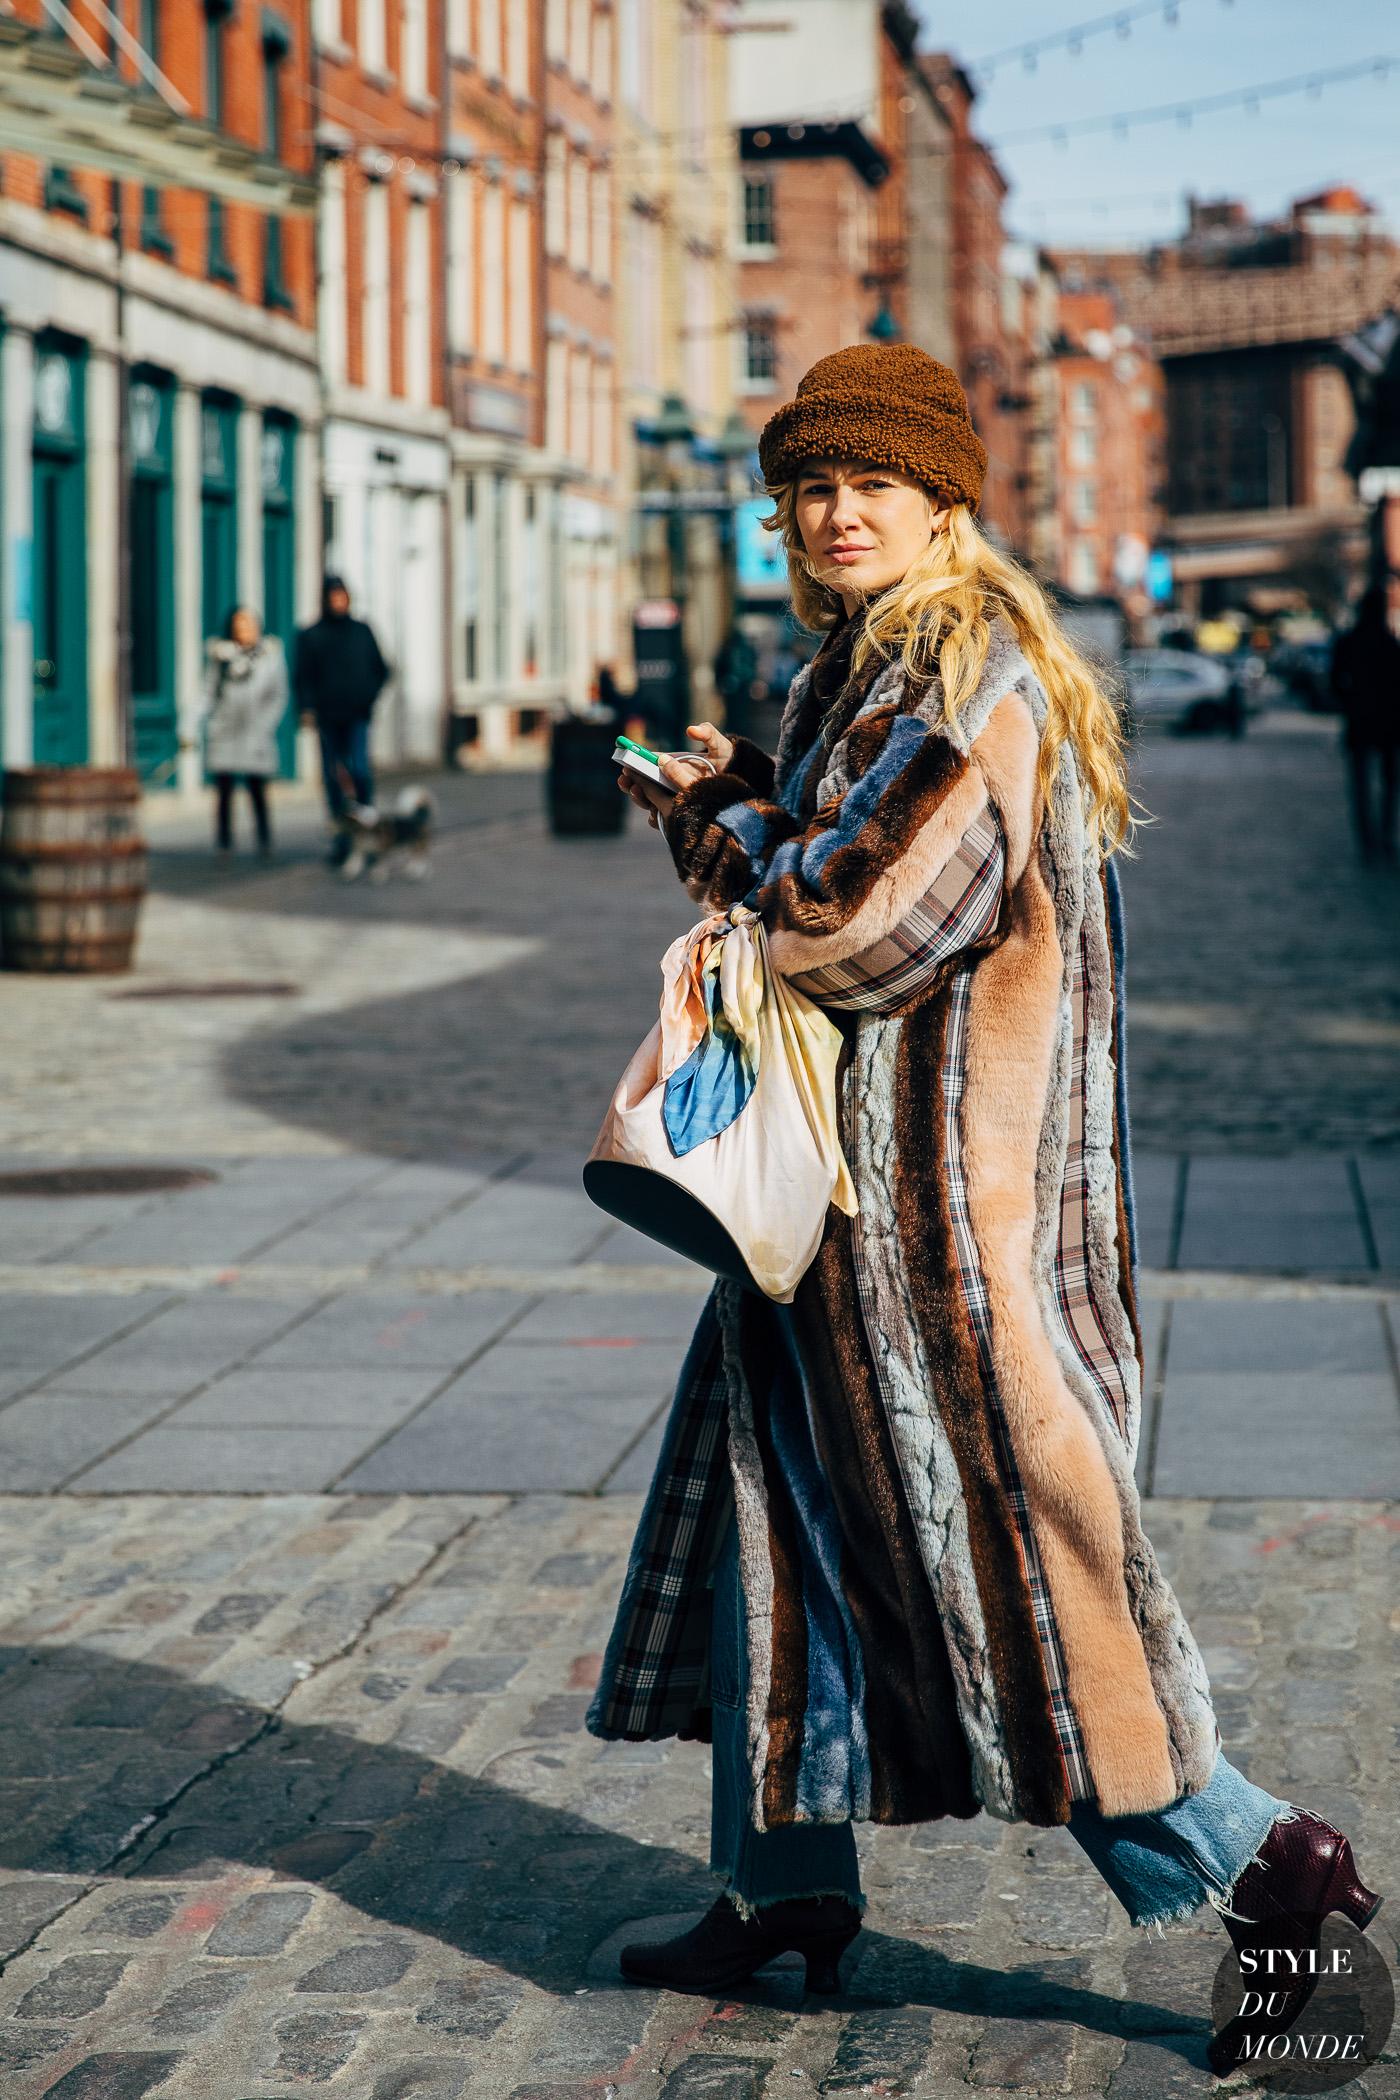 New York FW 2019 Street Style: Aleali May - STYLE DU MONDE